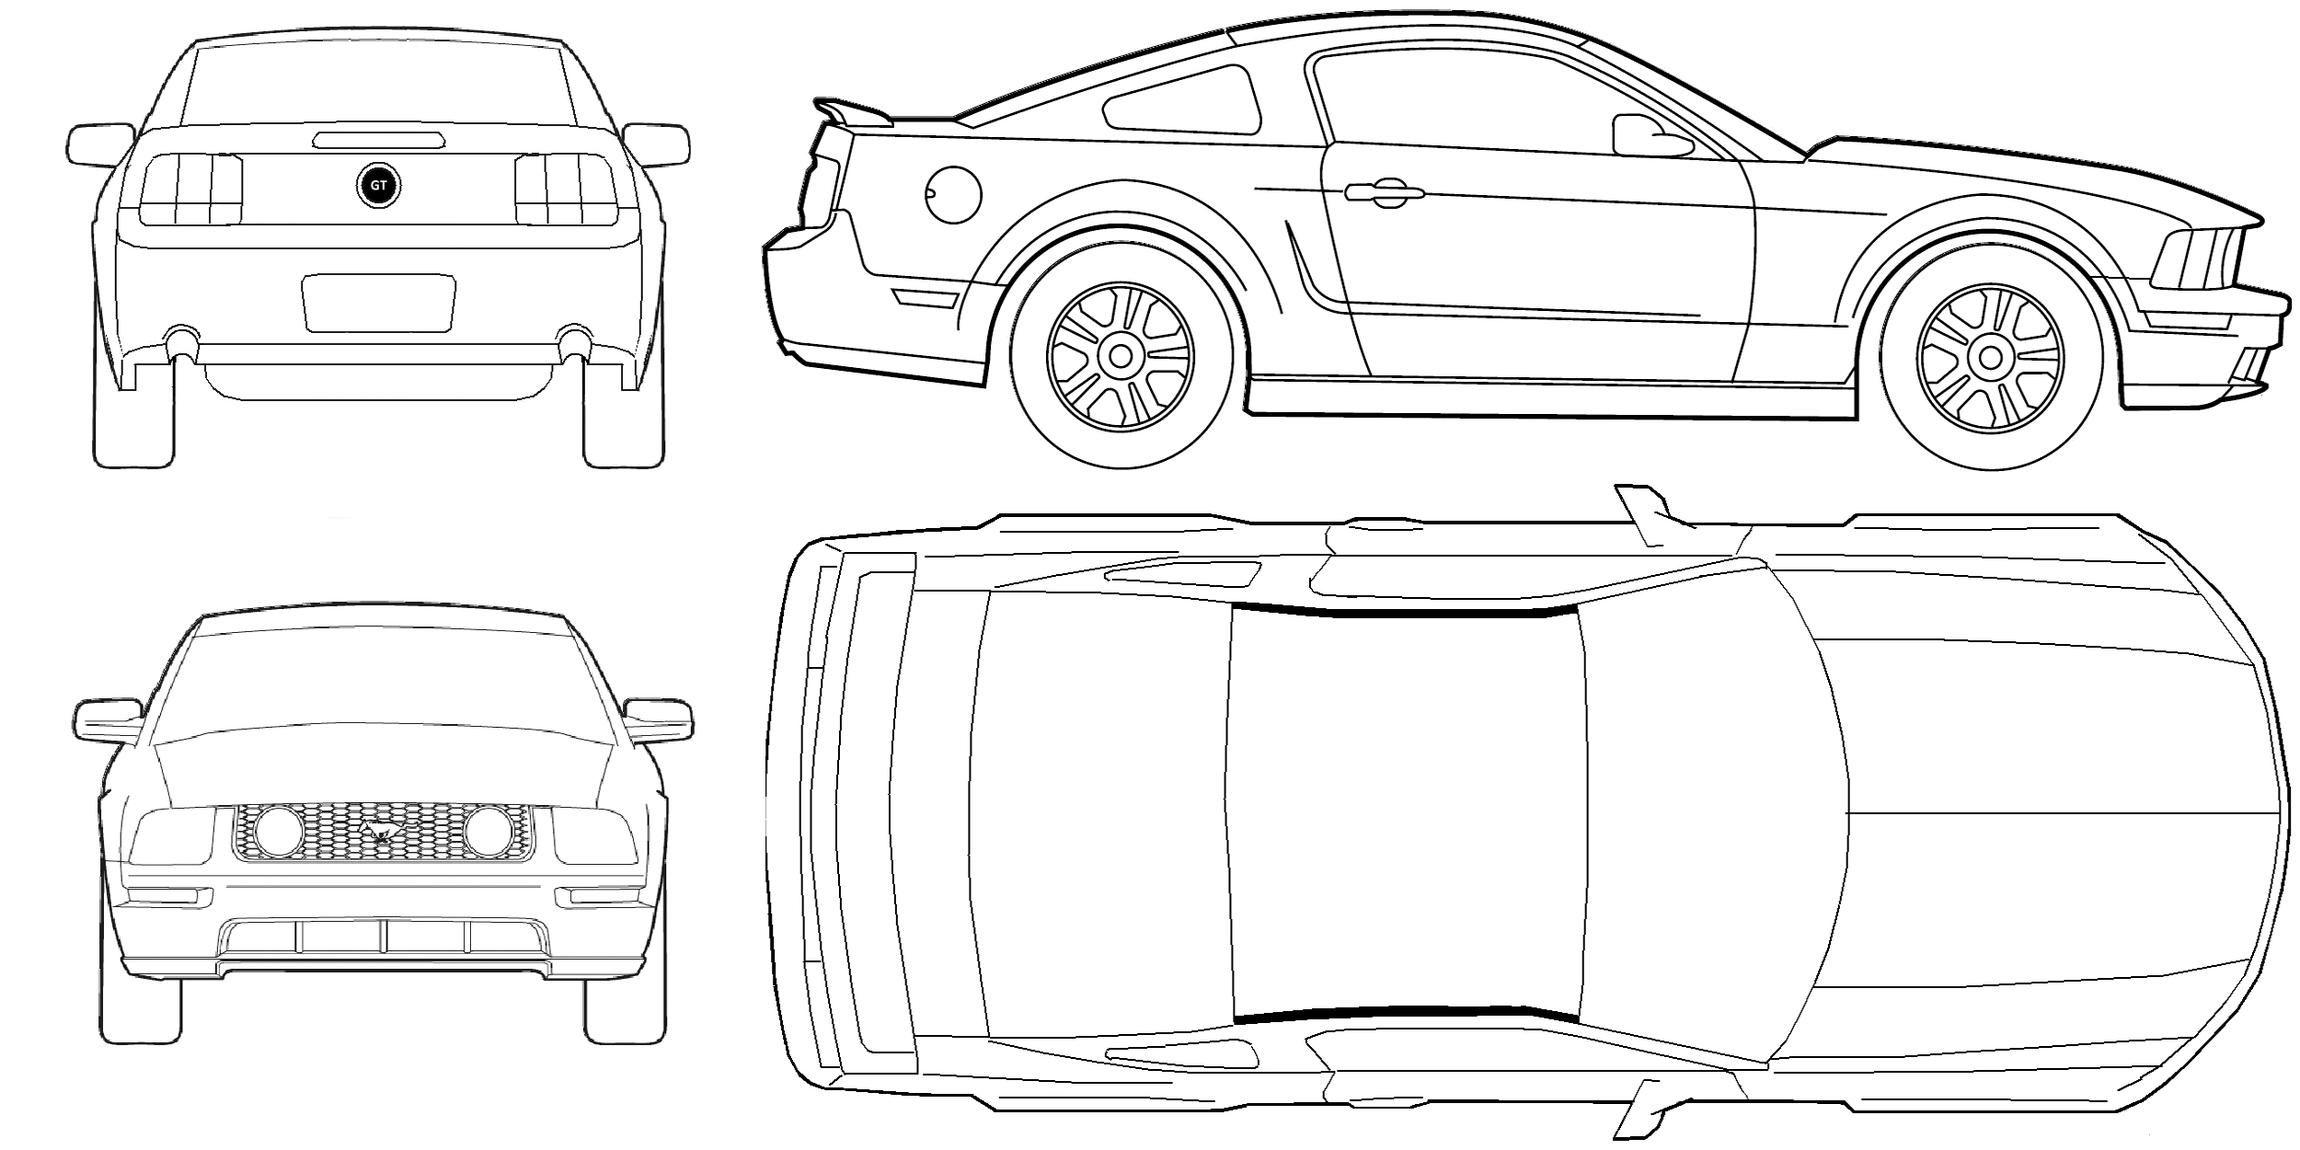 Mustang Blueprints